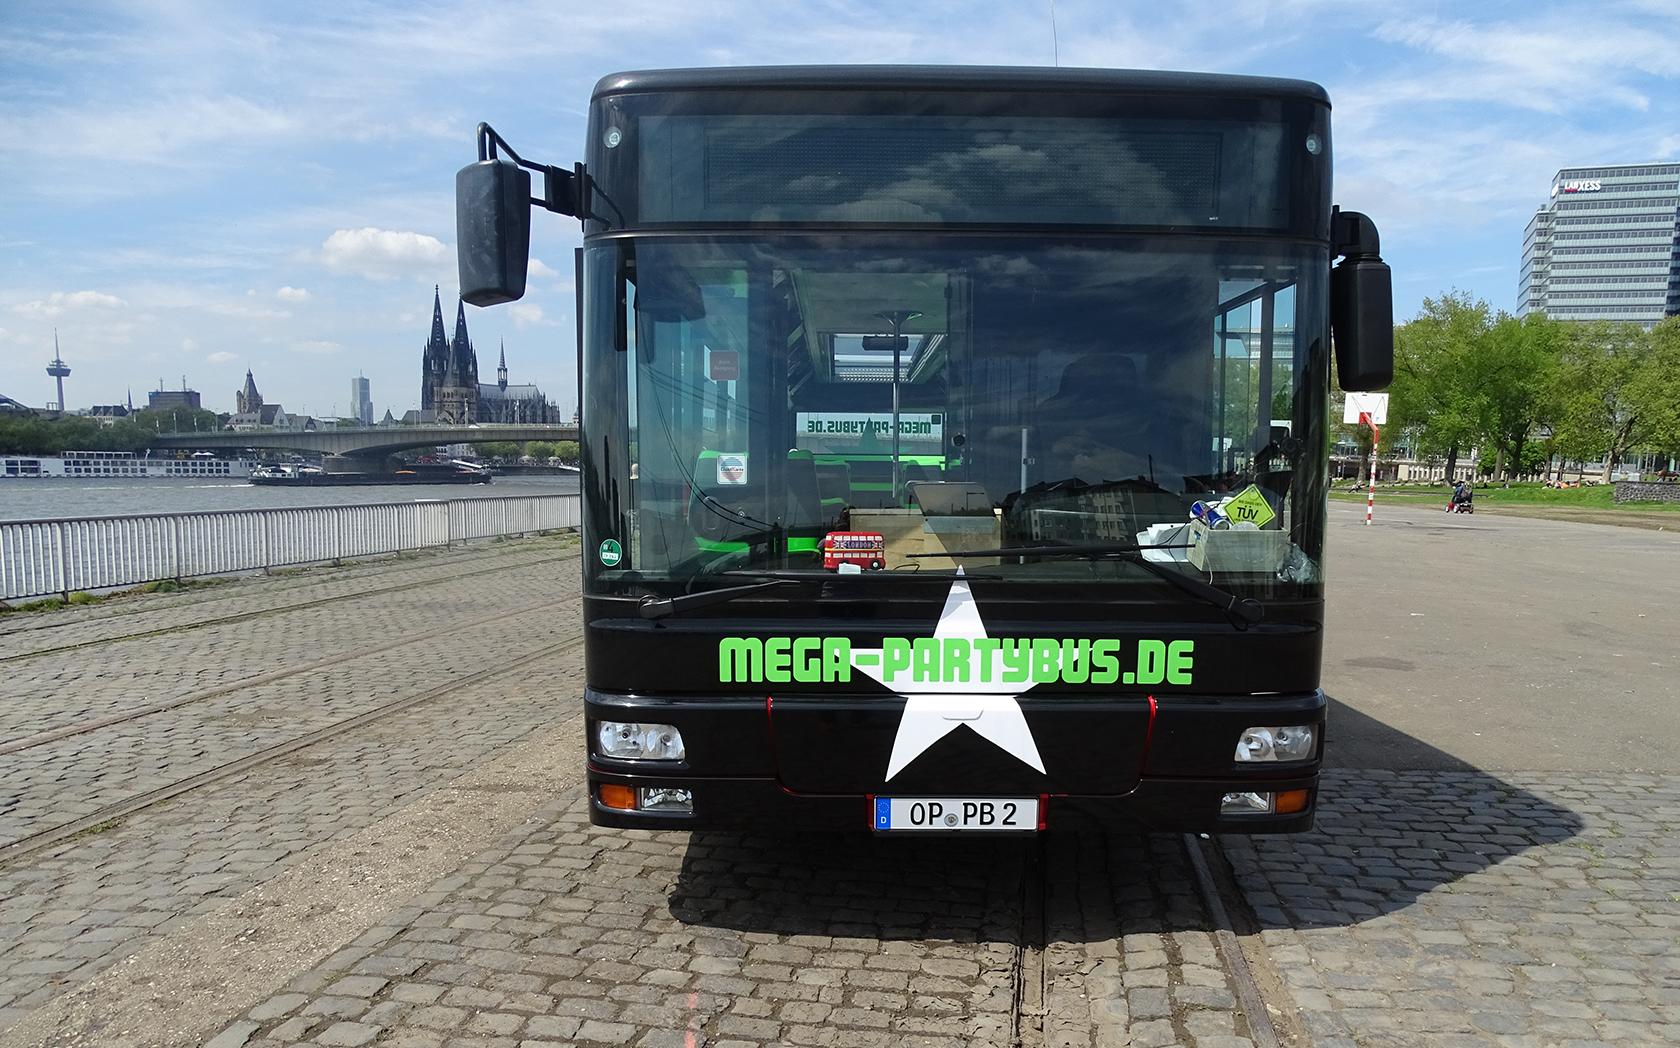 MEGA-Partybus 179